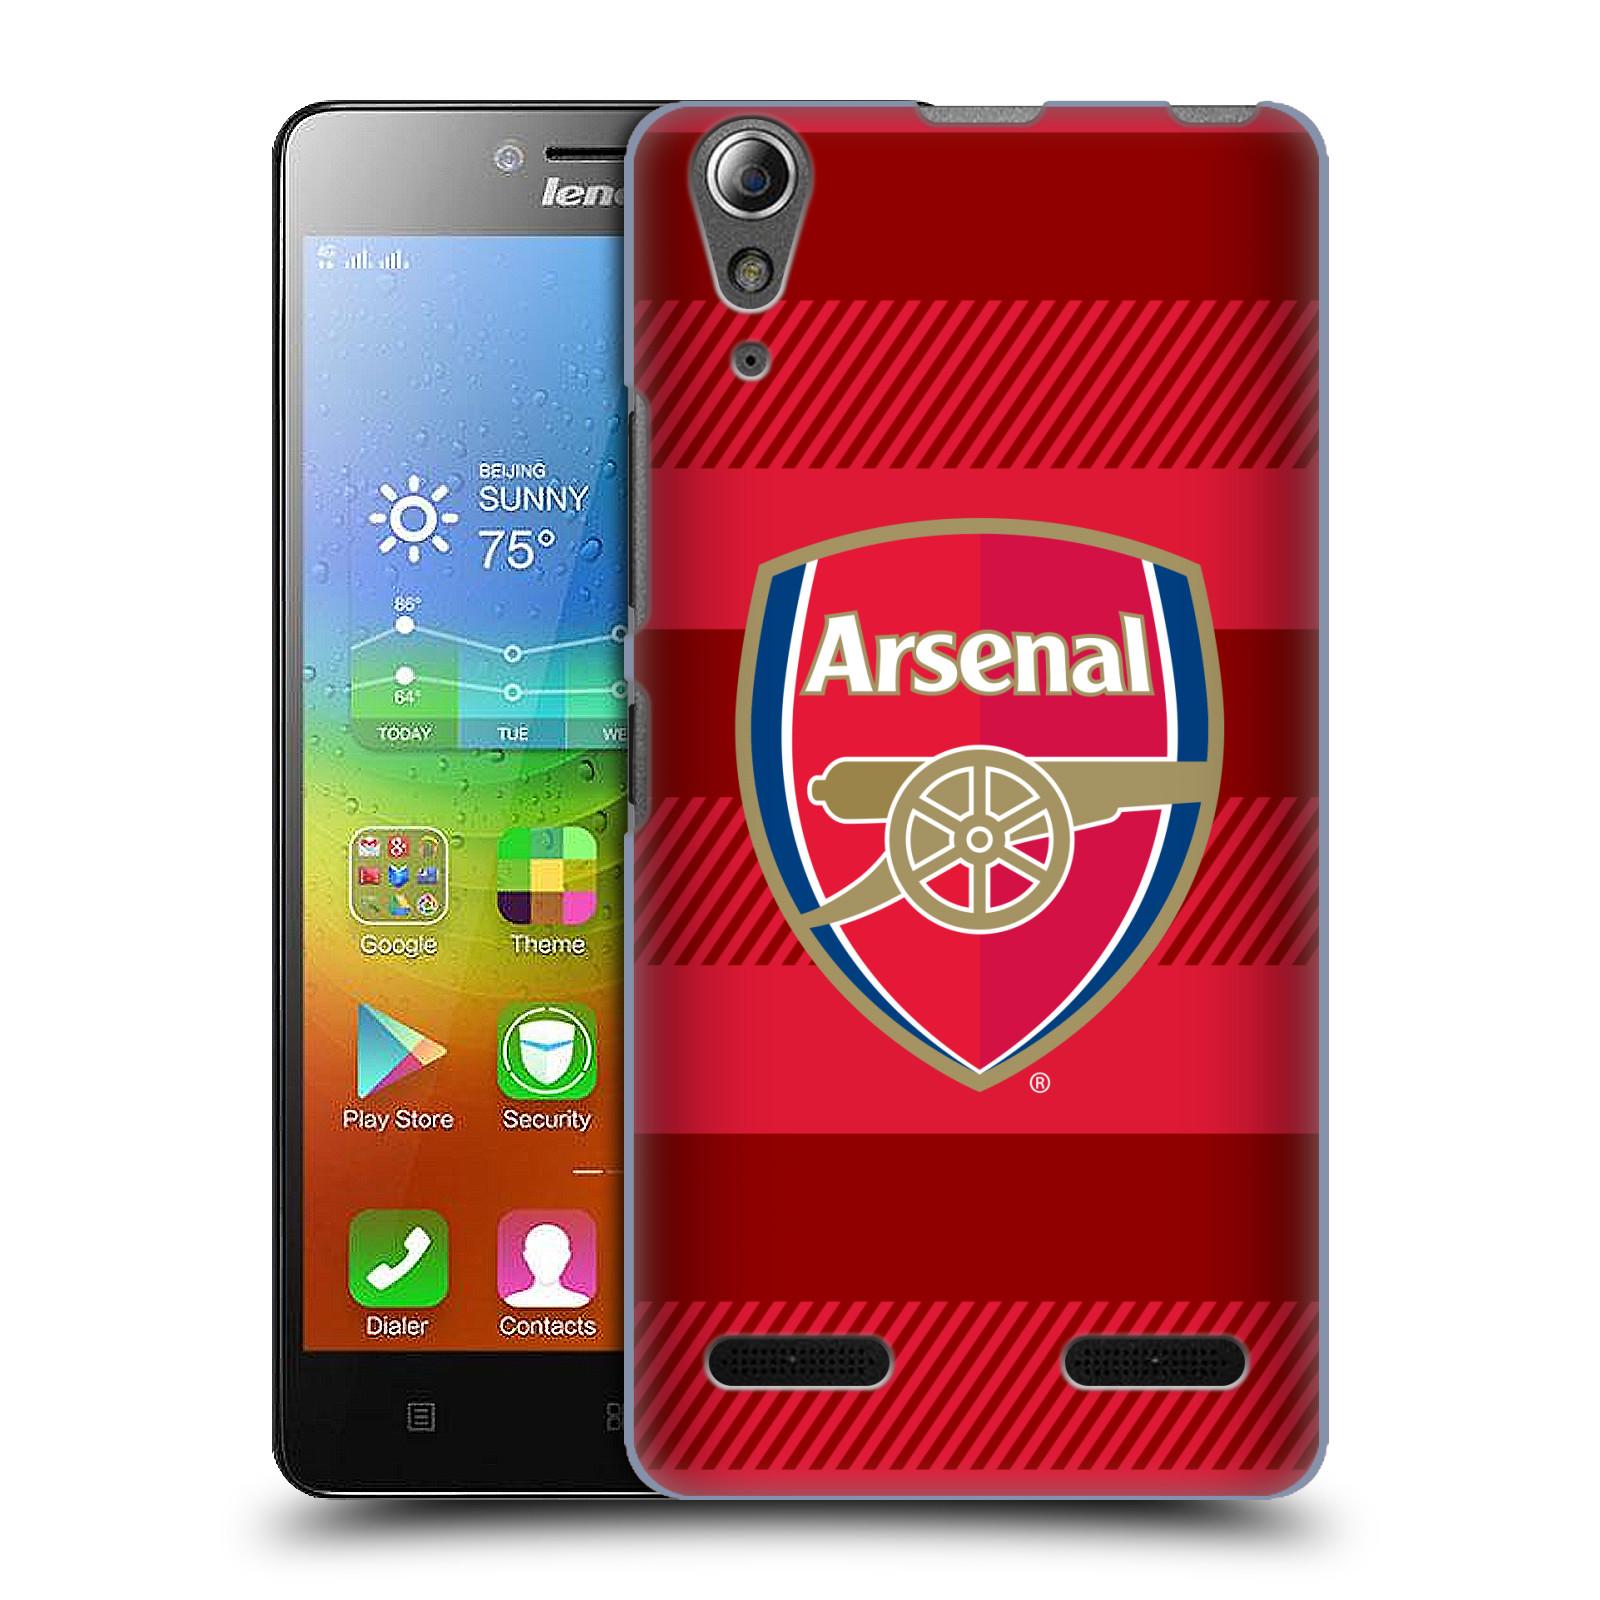 Plastové pouzdro na mobil Lenovo A6000 - Head Case - Arsenal FC - Logo s pruhy